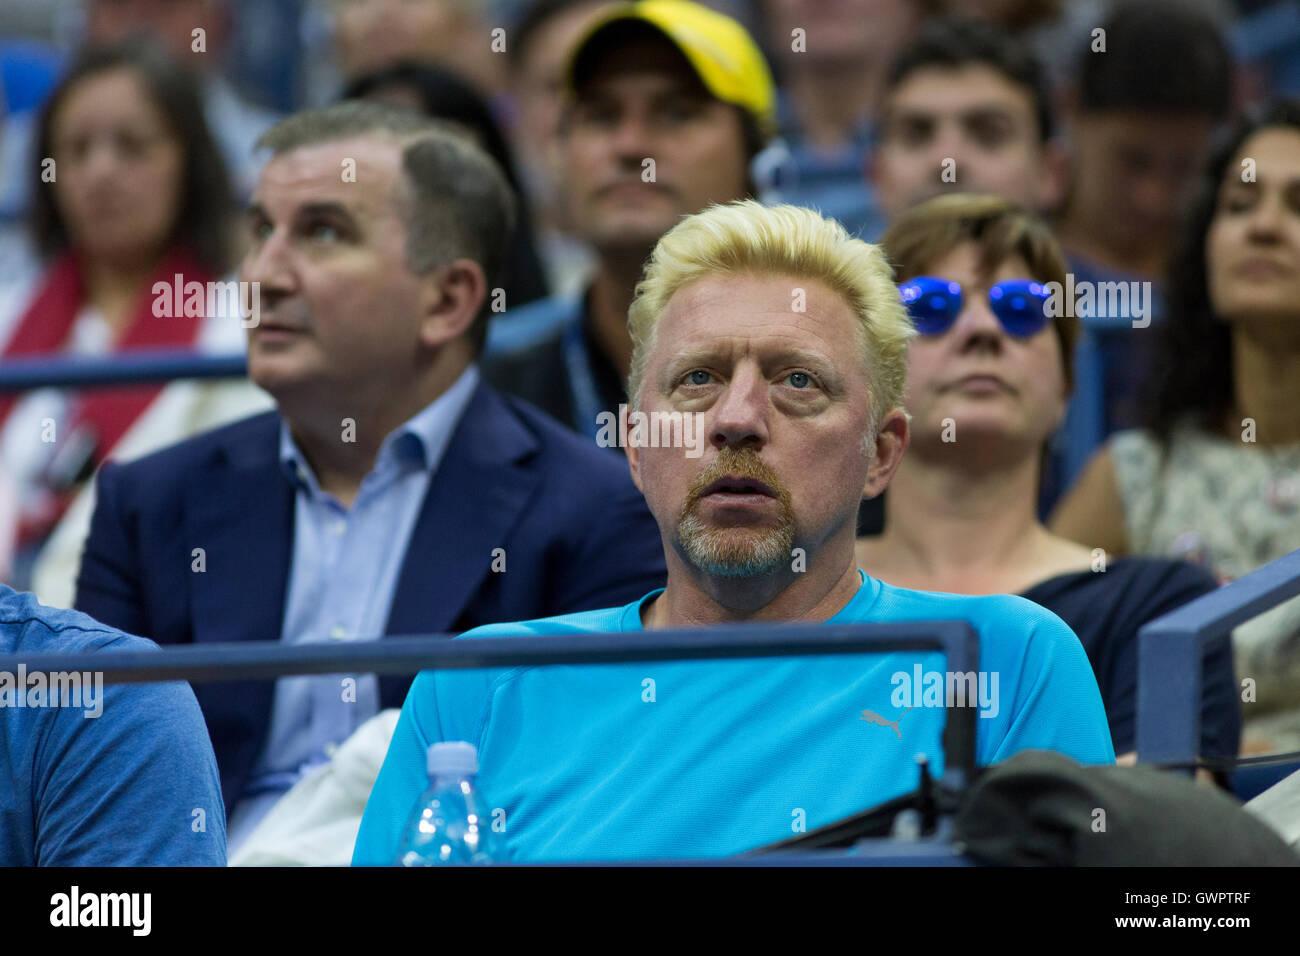 Boris Becker, Novak Djokovic's (SRB) coach watches the 2016 US Open Men's Final - Stock Image